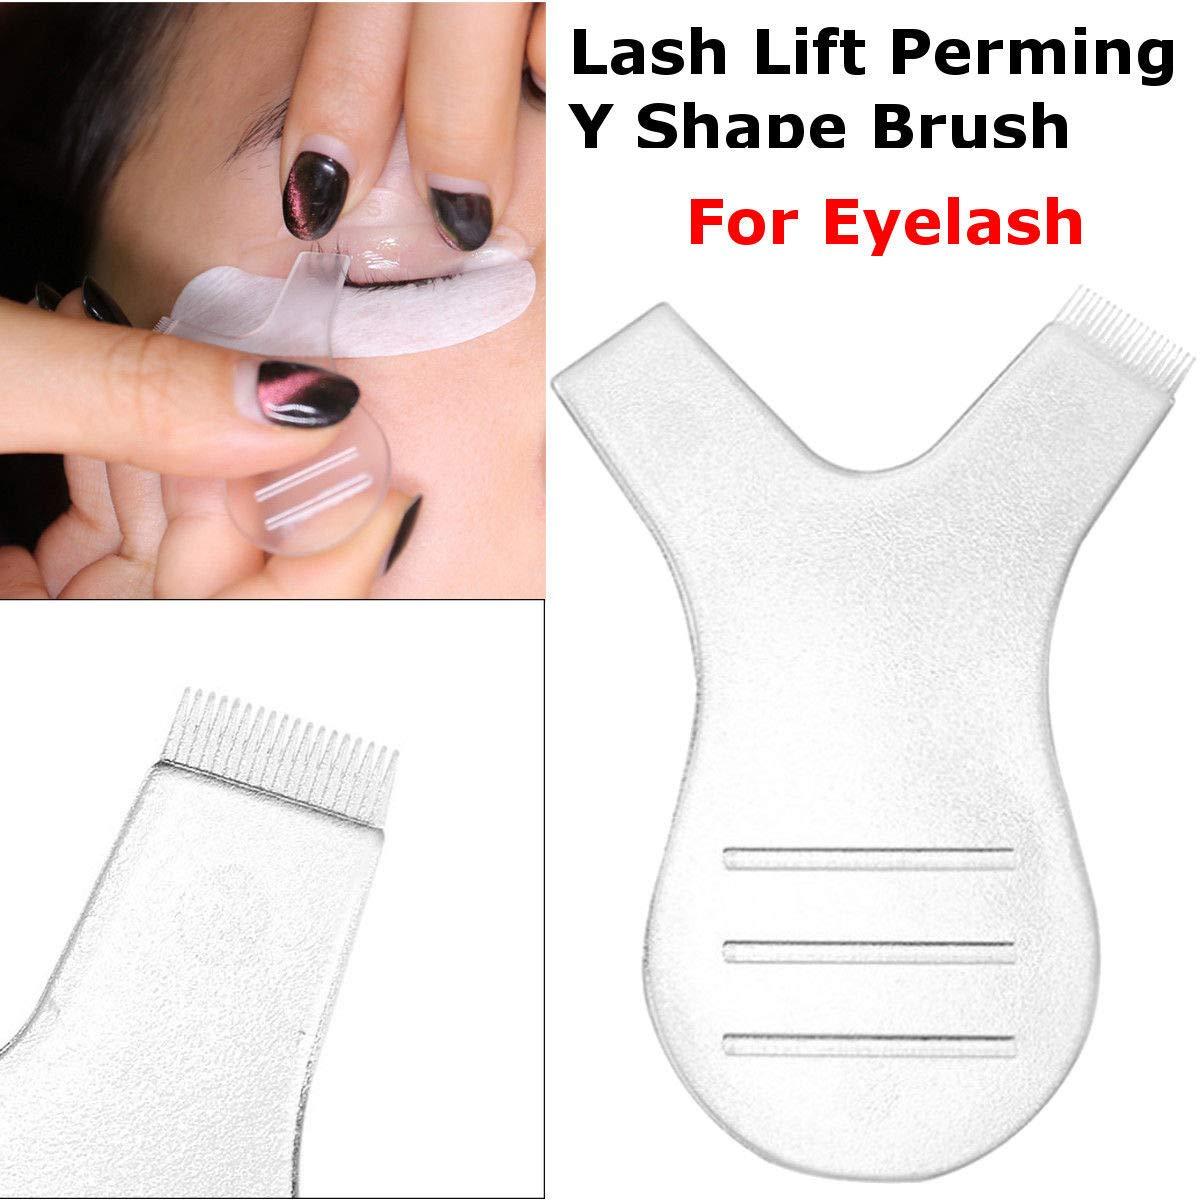 Eye shadow applicators 20/30/50pcs Eyelash Brush Eye Lash Y Shape Make Up Clean Wands Applicator For Eyelash Perming Curler Eyrlashes Extension Tool